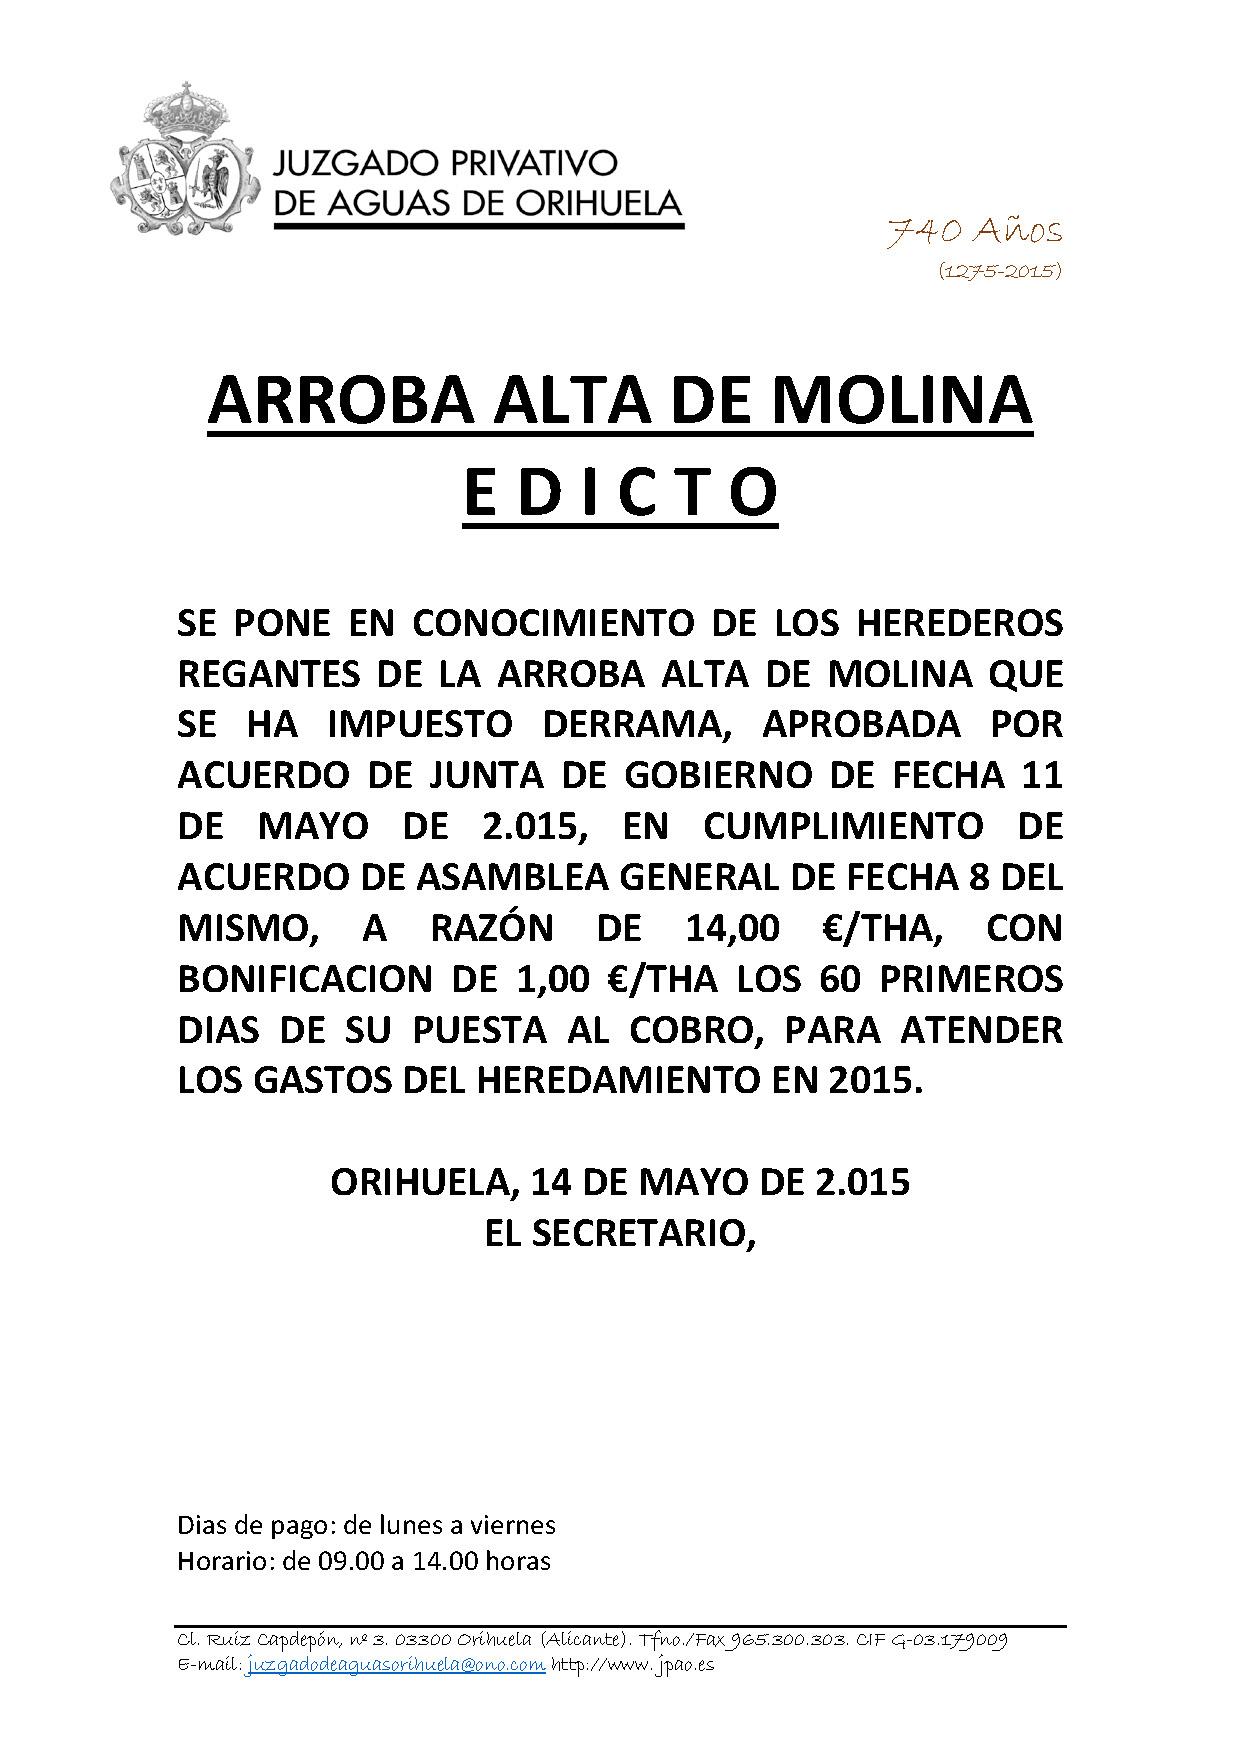 ARROBA ALTA DE MOLINA  Edicto